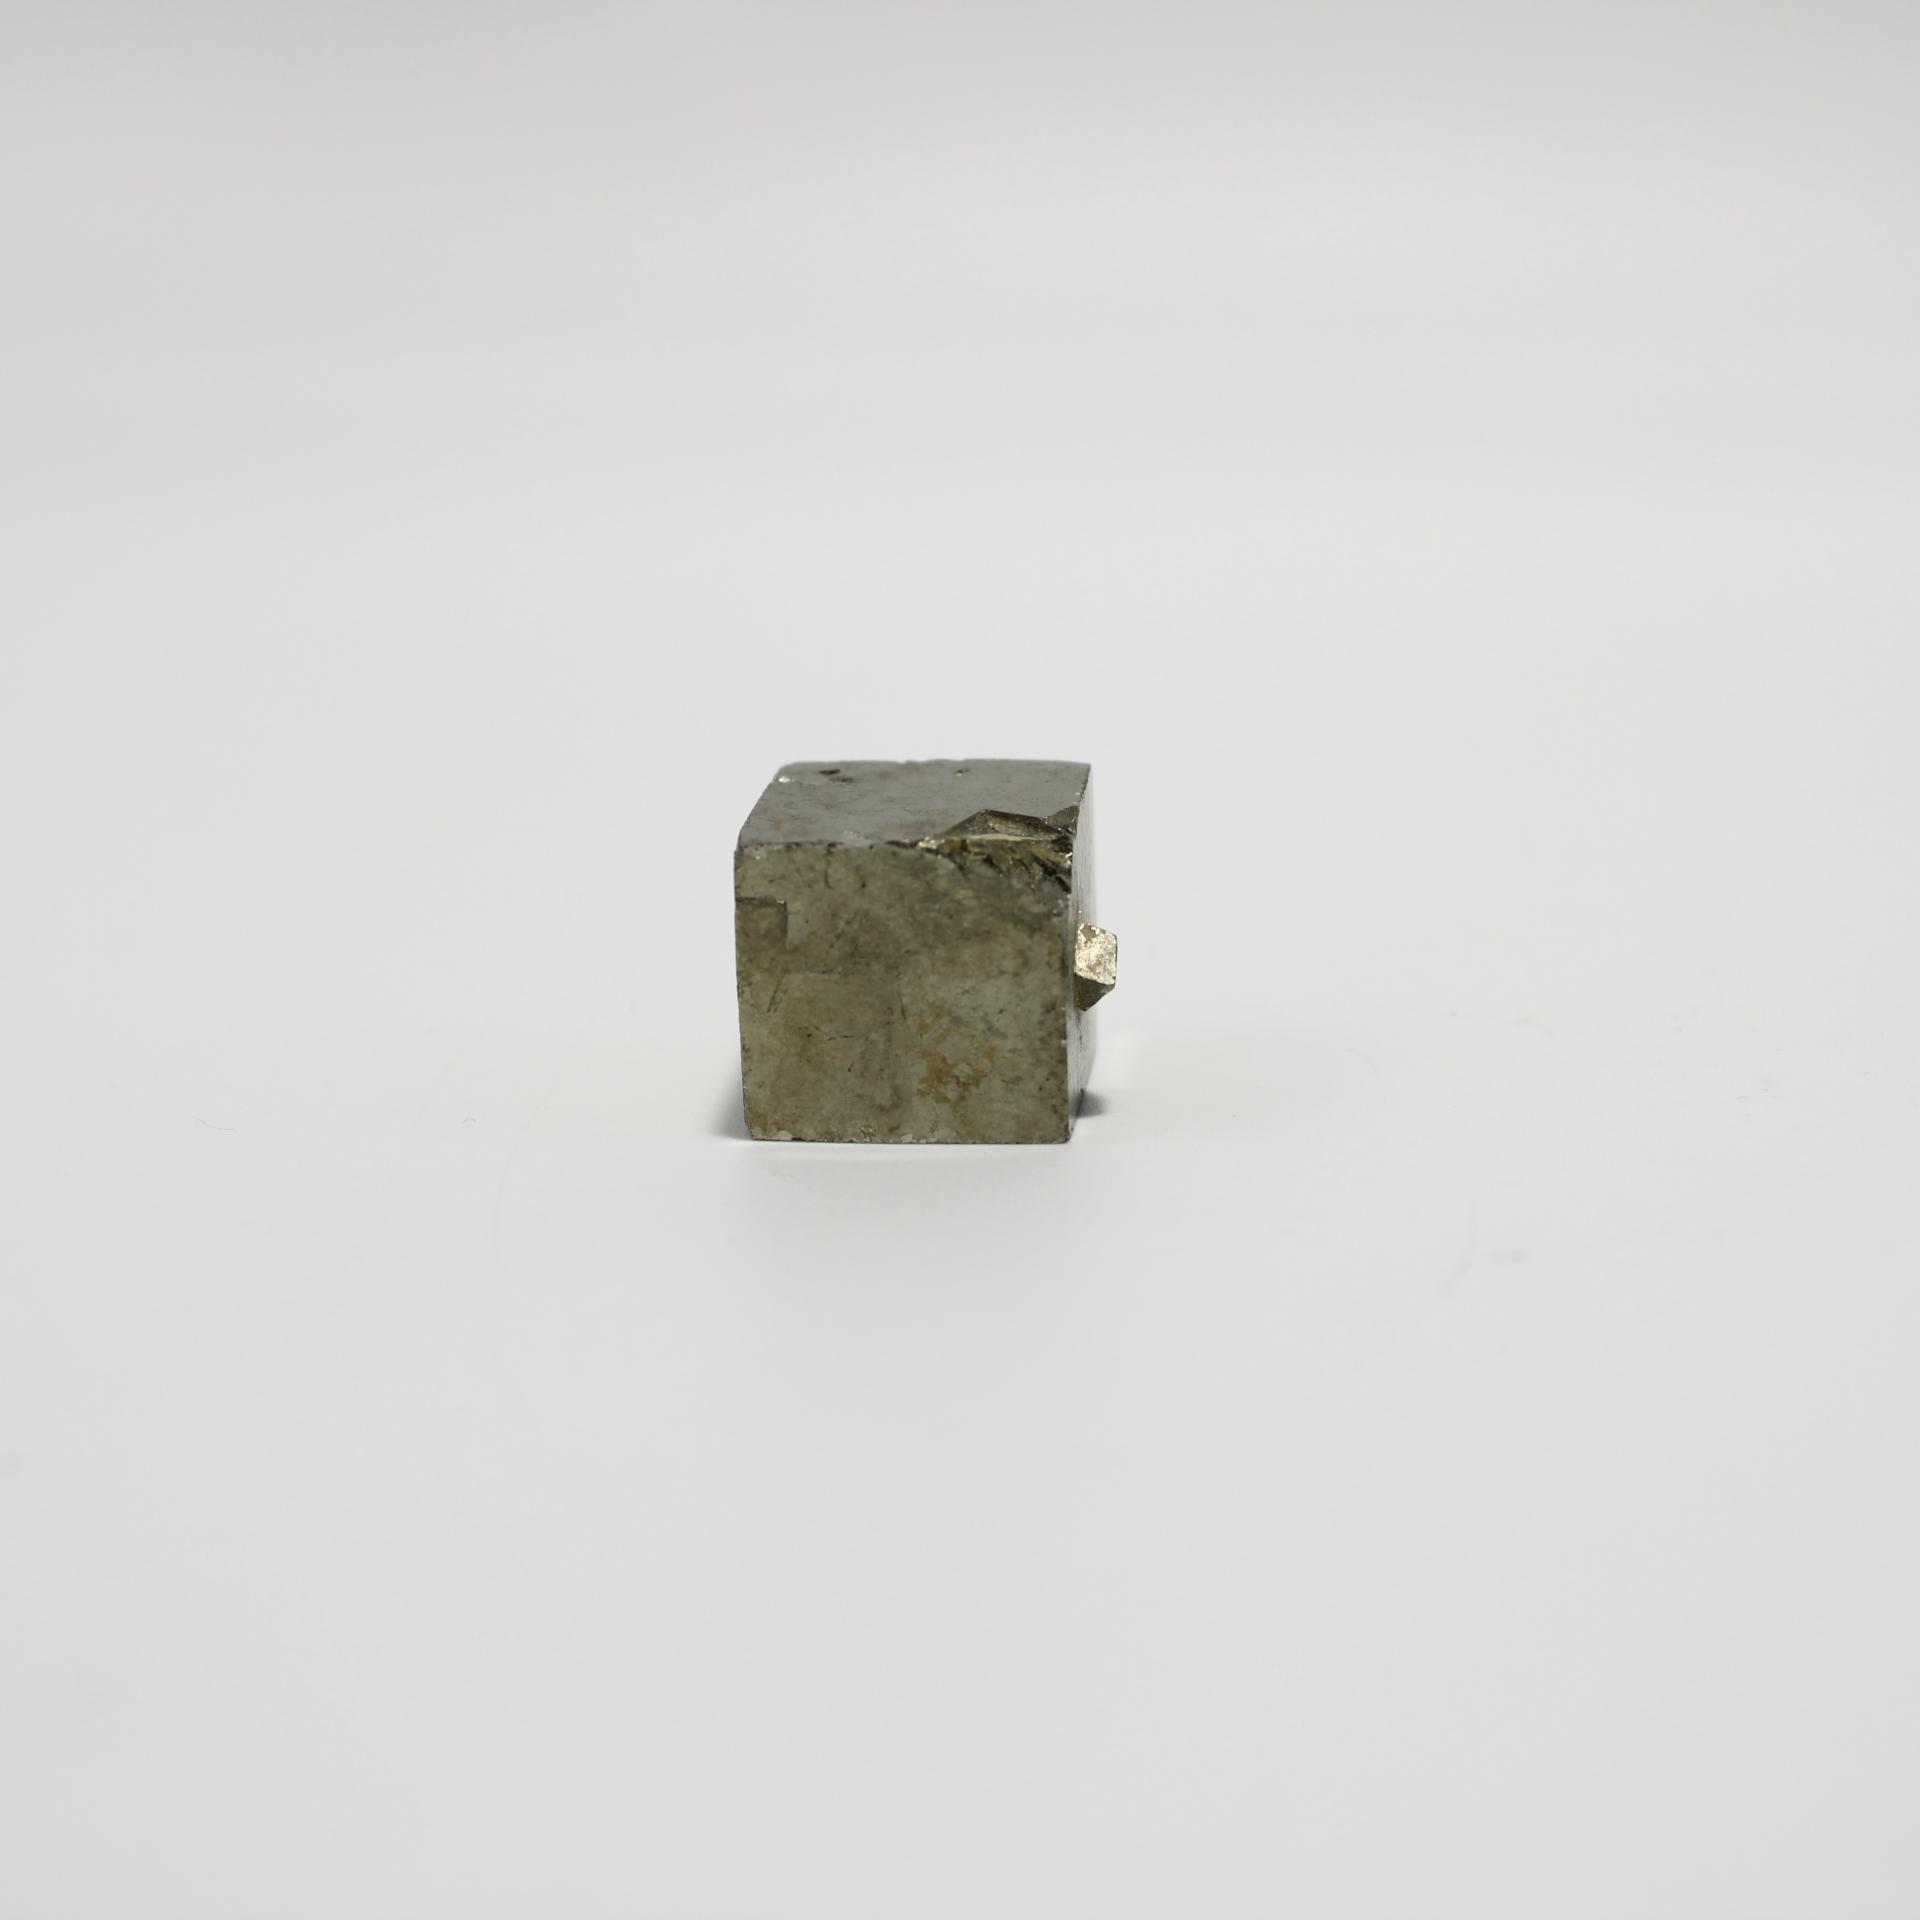 I75 pyritecube 2